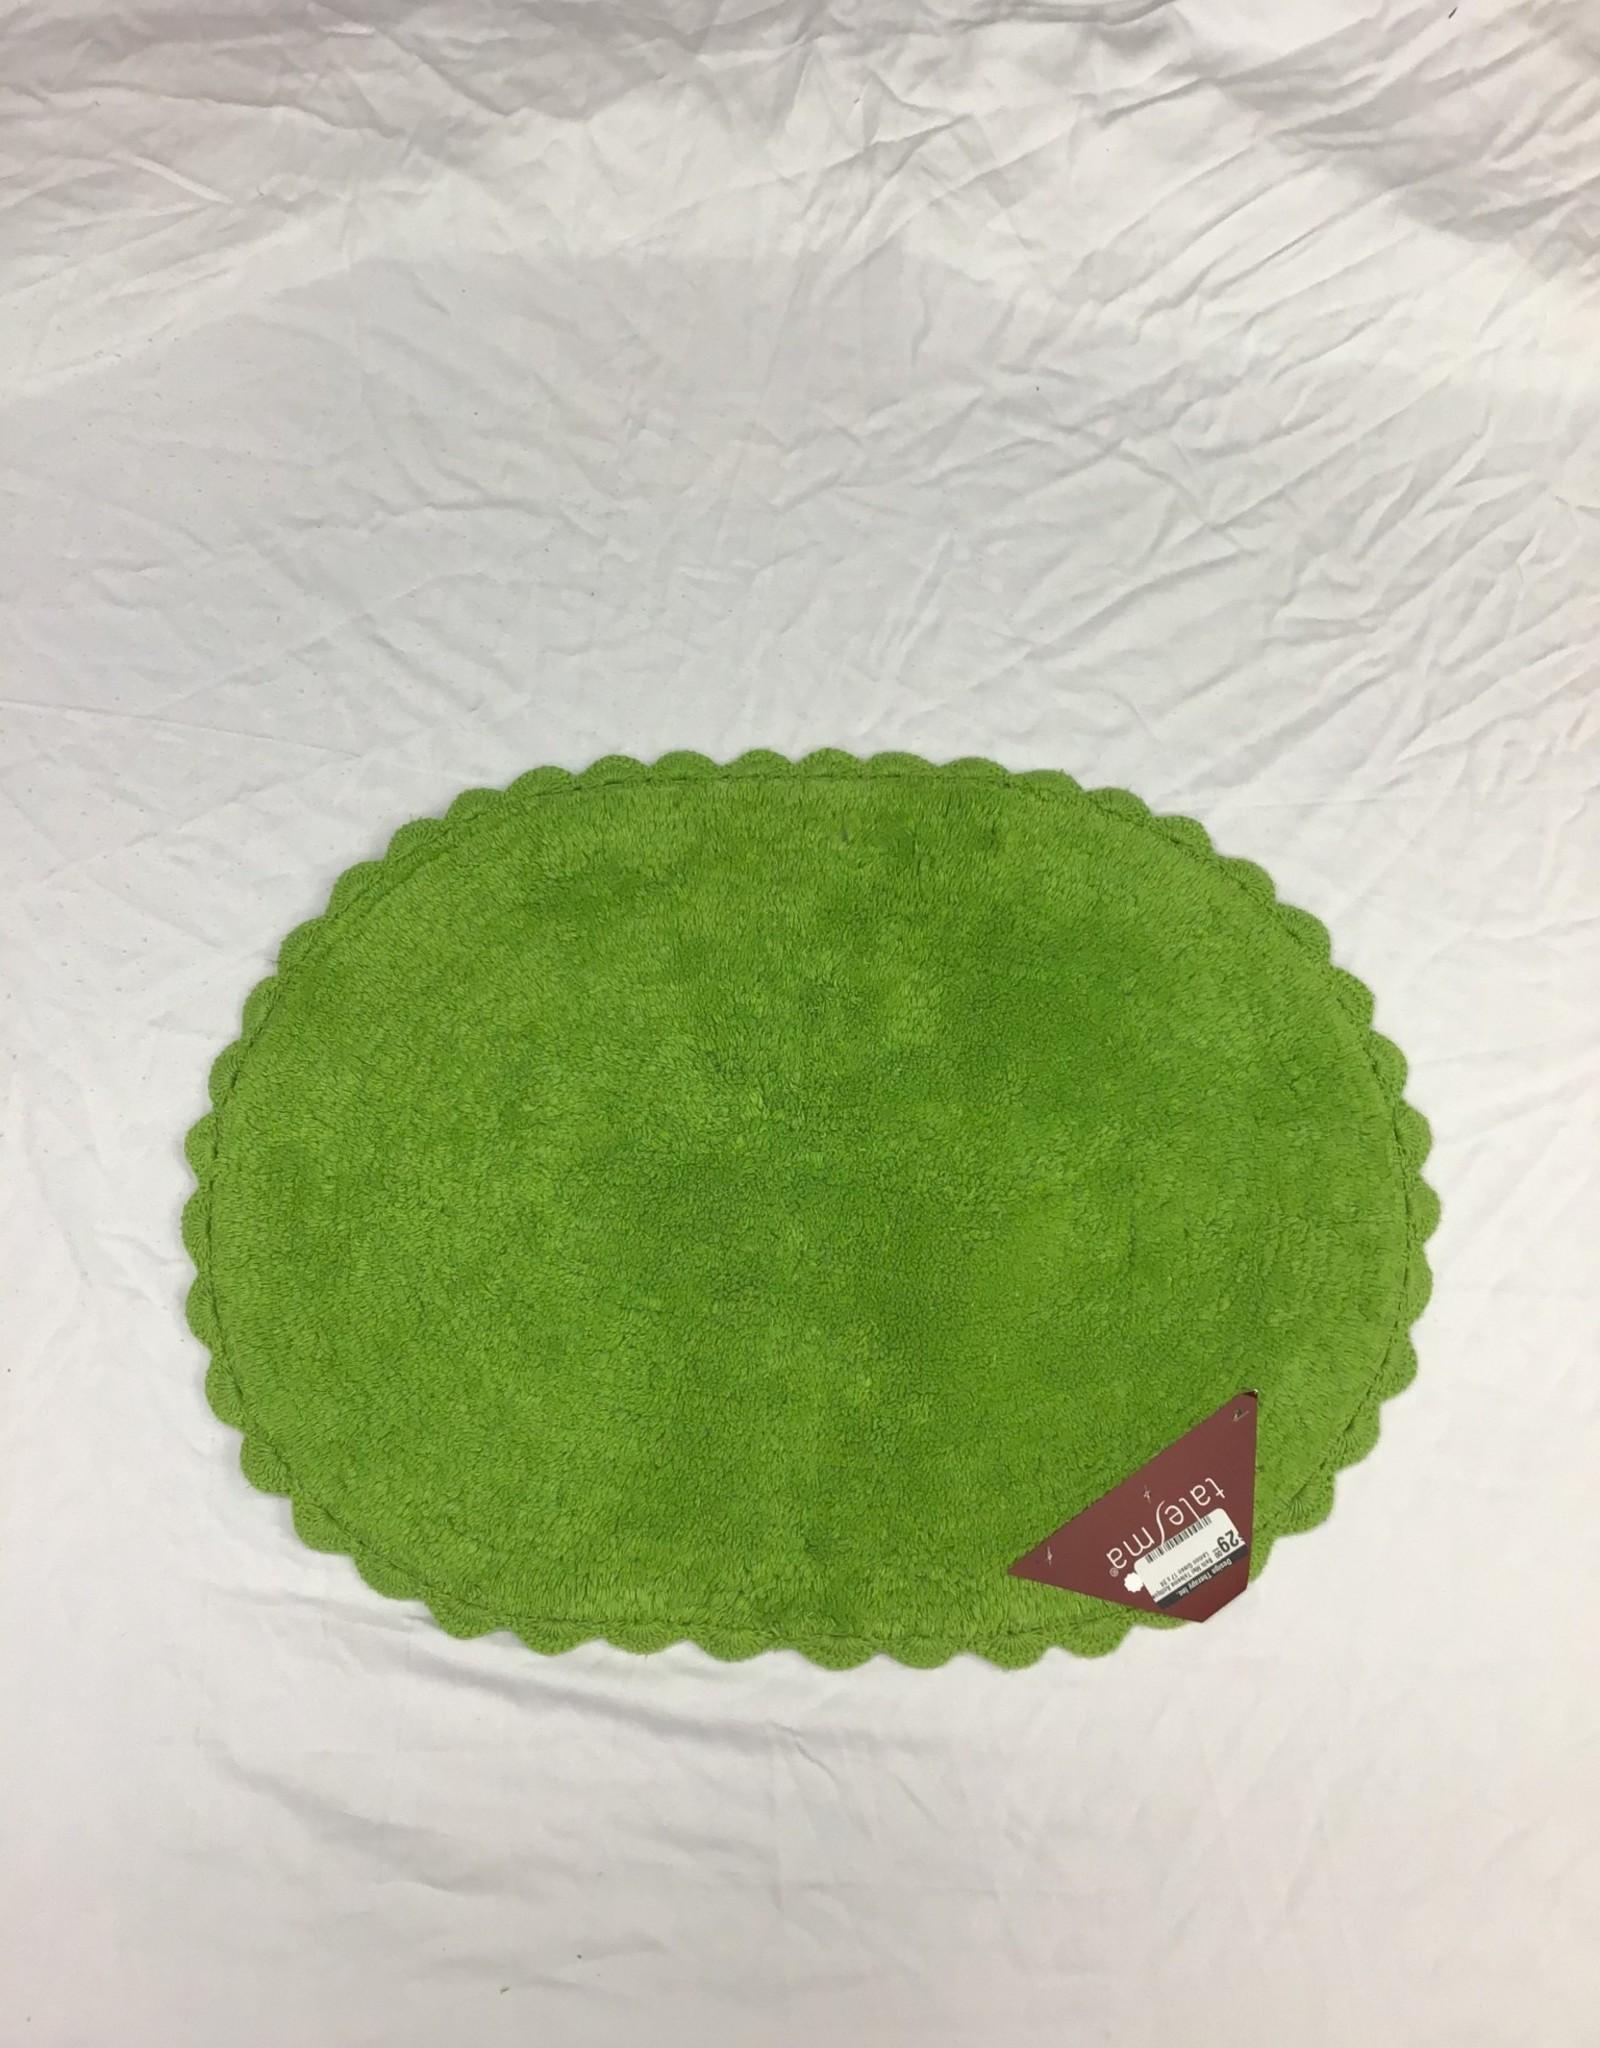 Intermark Bath Mat Talesma Antique Lemon Green 17 x 24